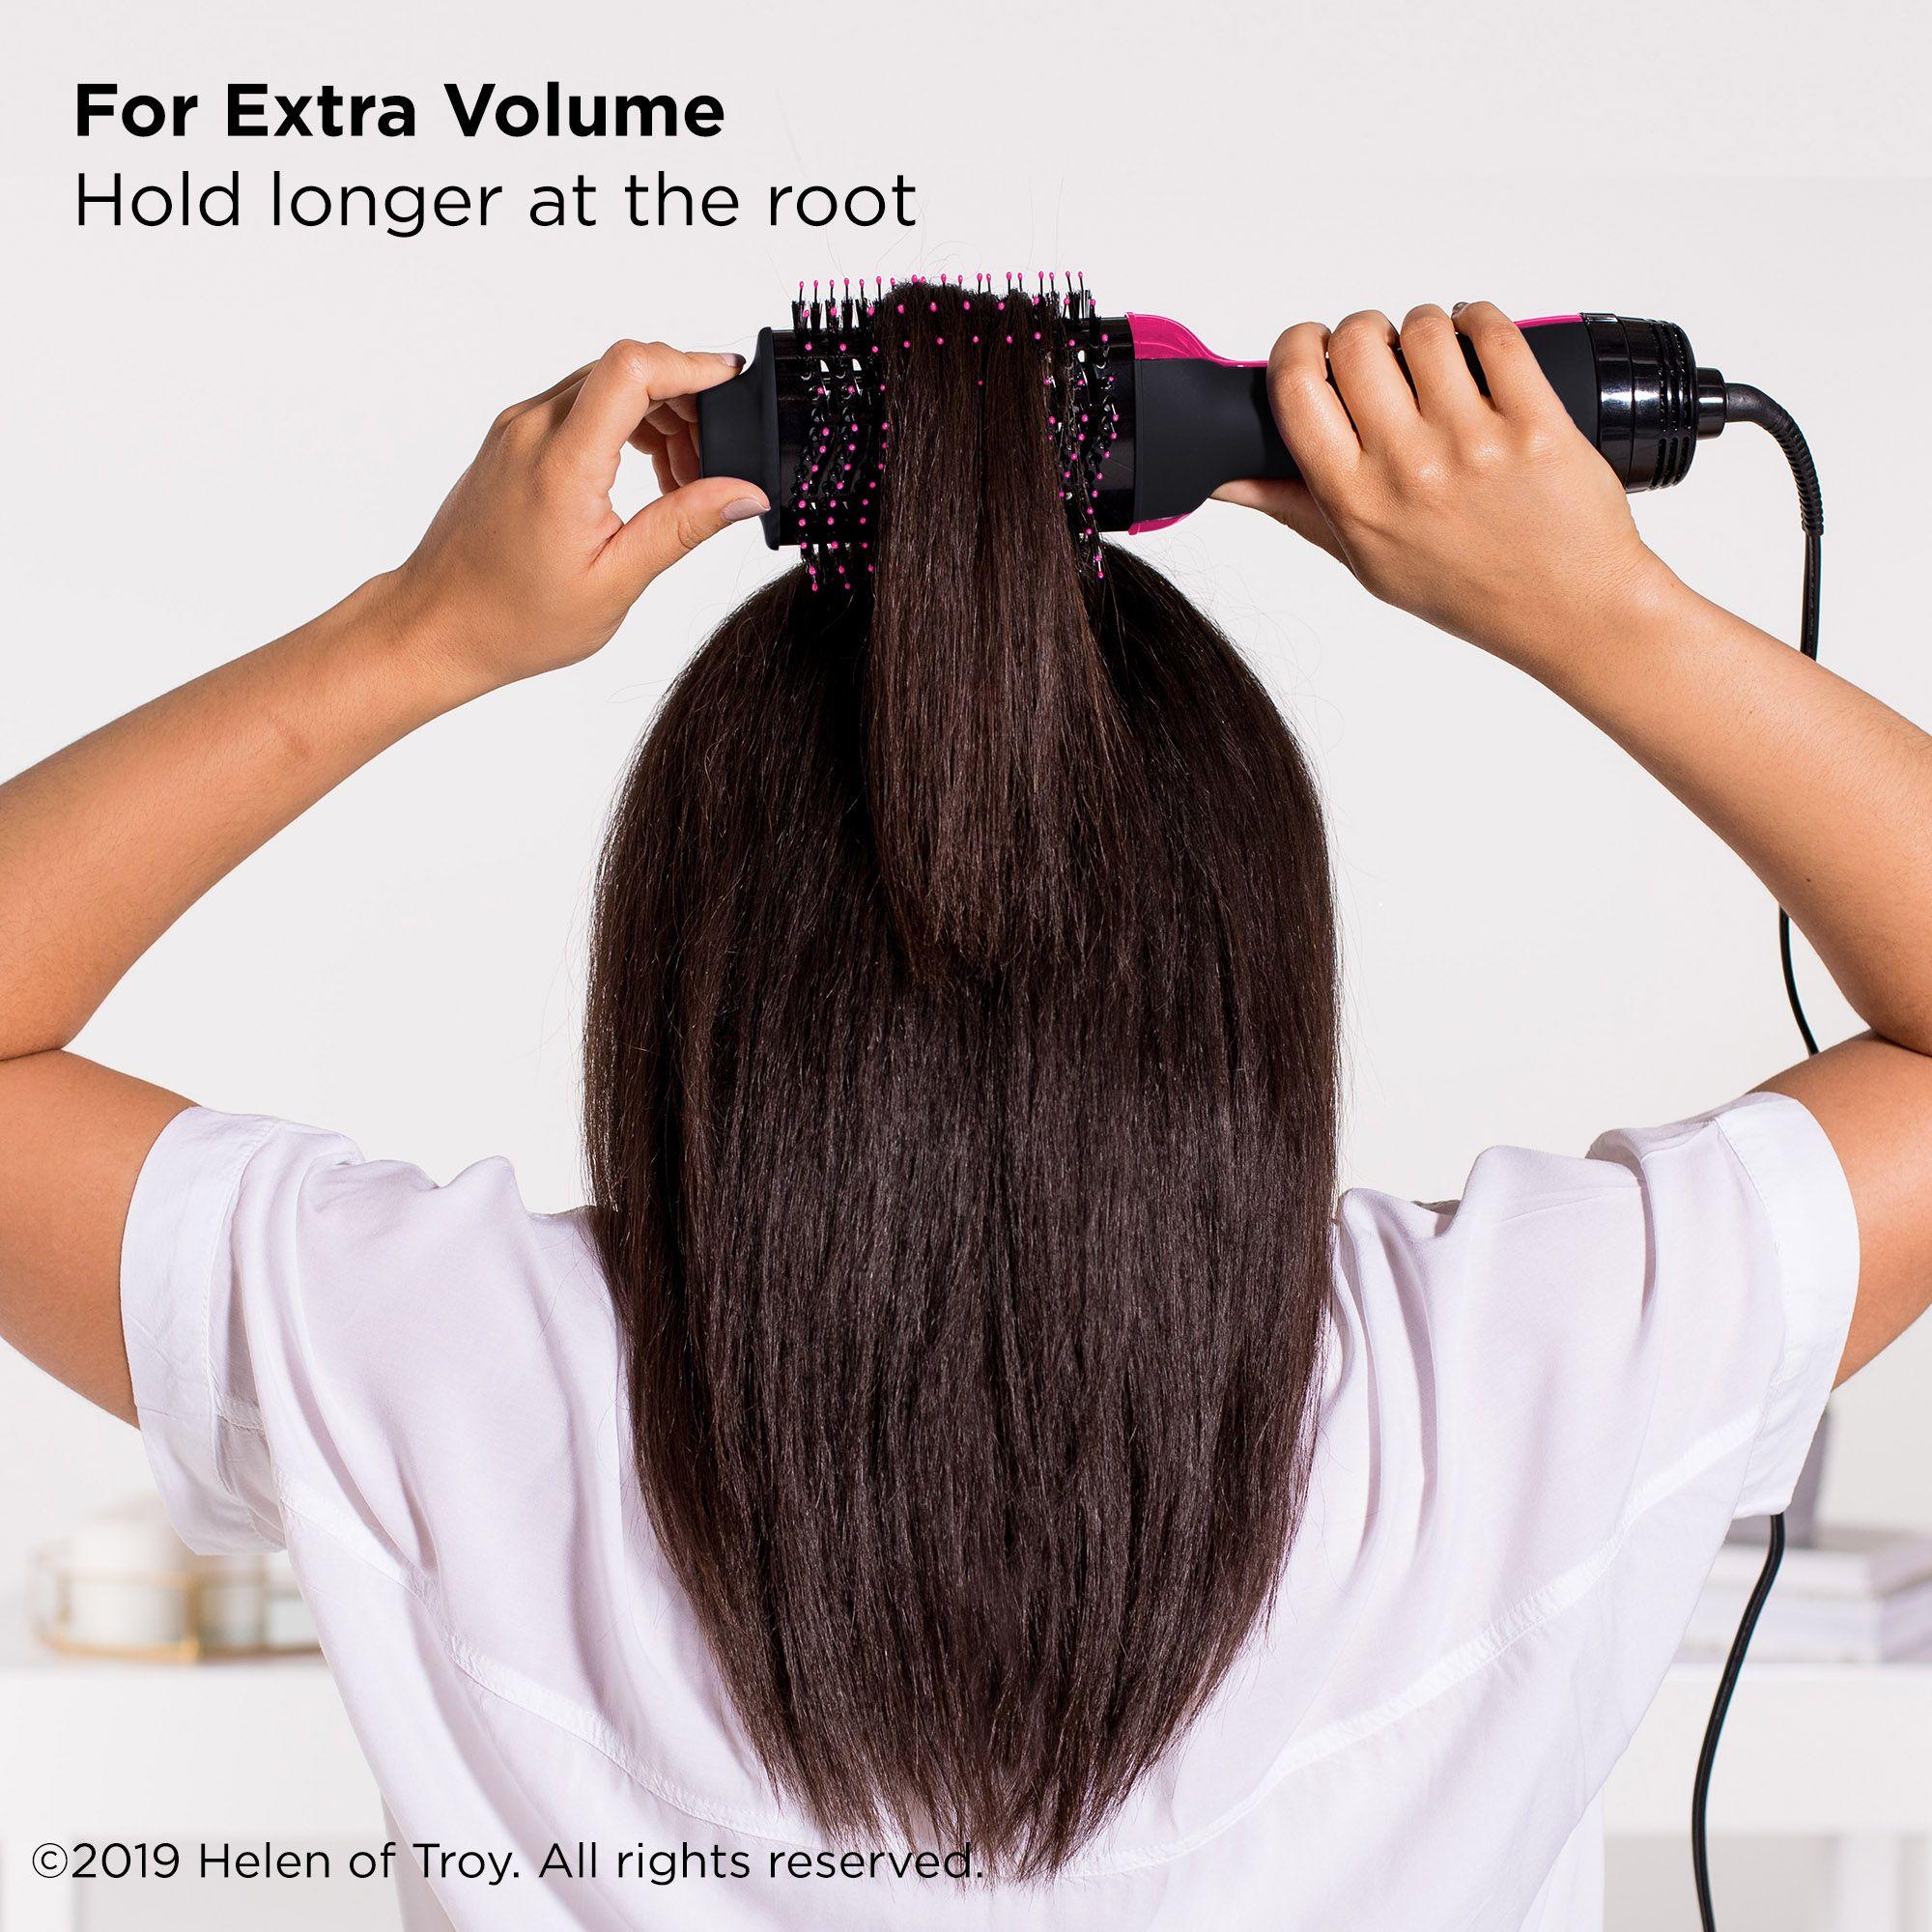 Revlon One Step Volumizer Hair Dryer And Hot Air Brush Black Walmart Com Revlon Hair Dryer Best Hair Dryer Revlon Hair Dryer Brush